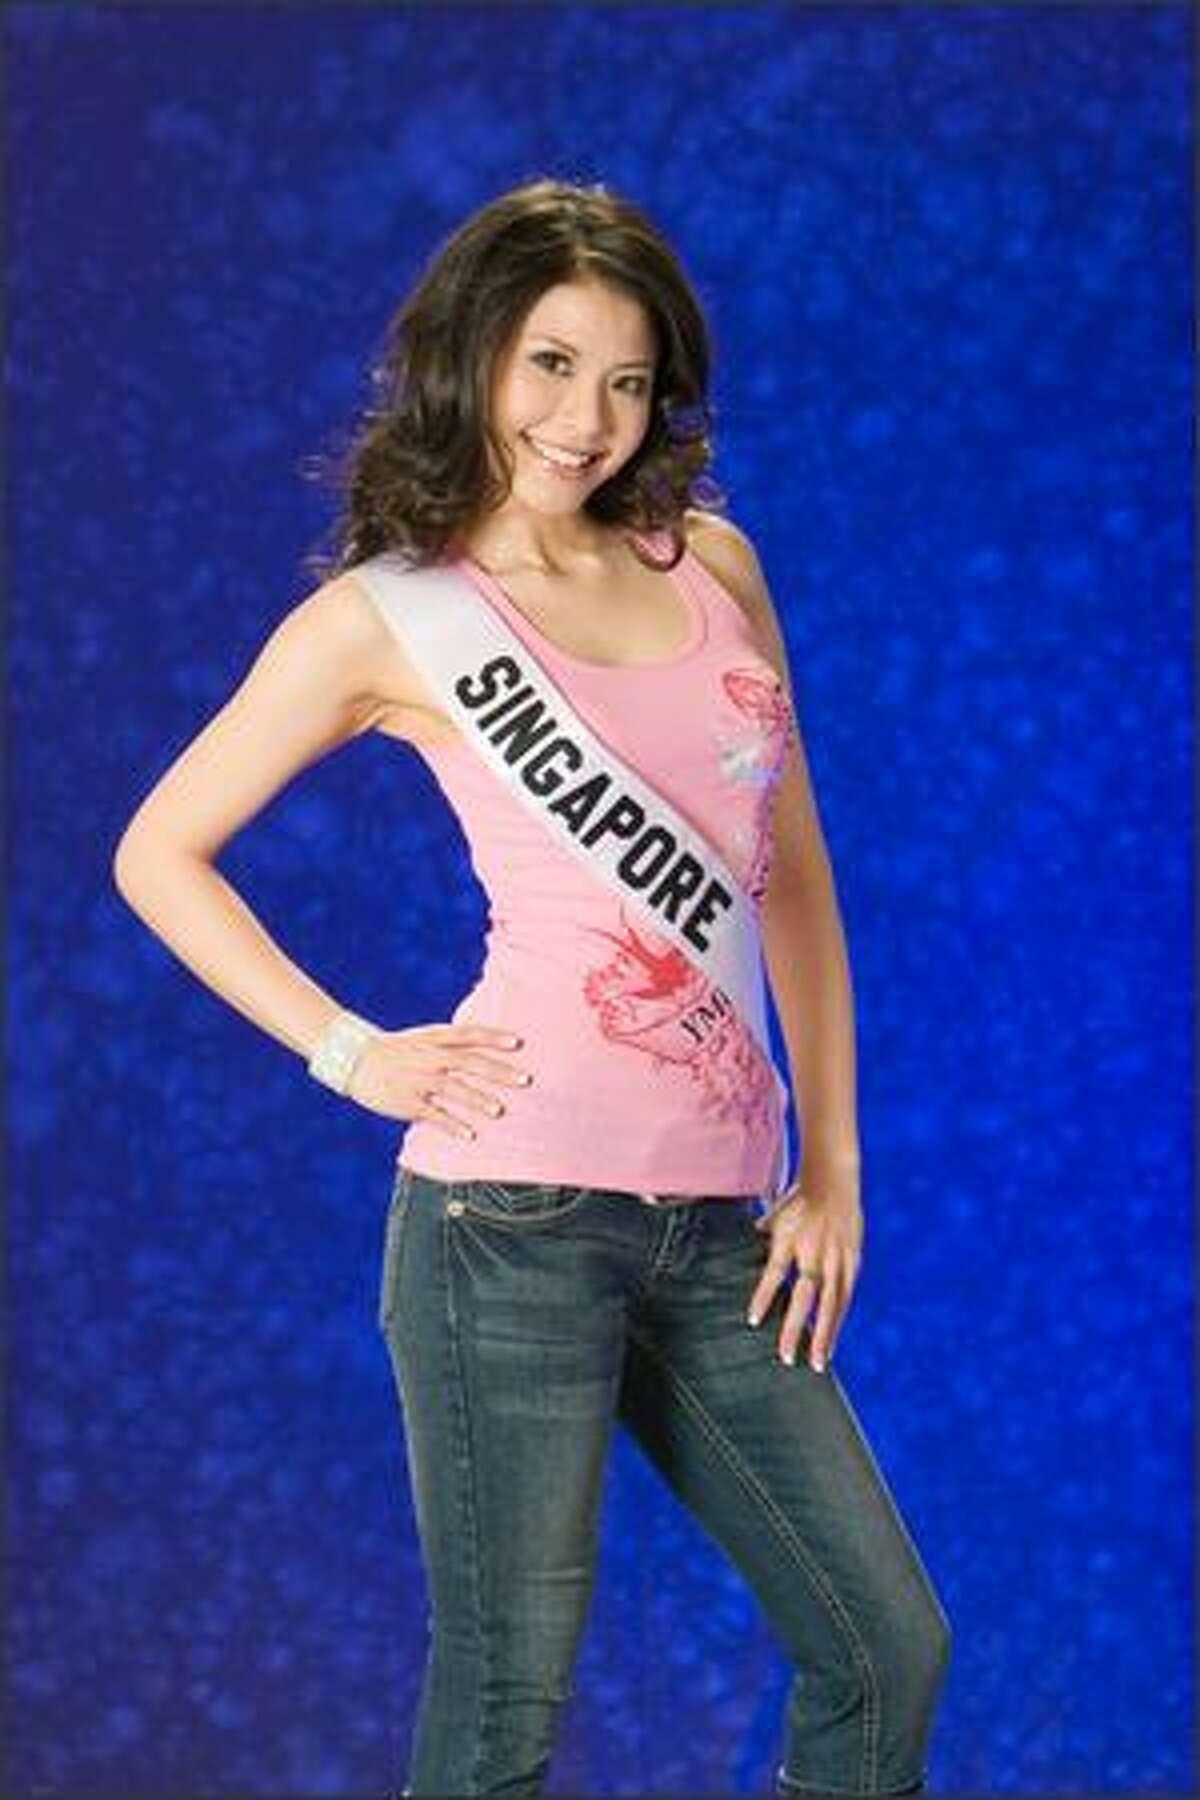 Jessica Tan, Miss Singapore 2007.